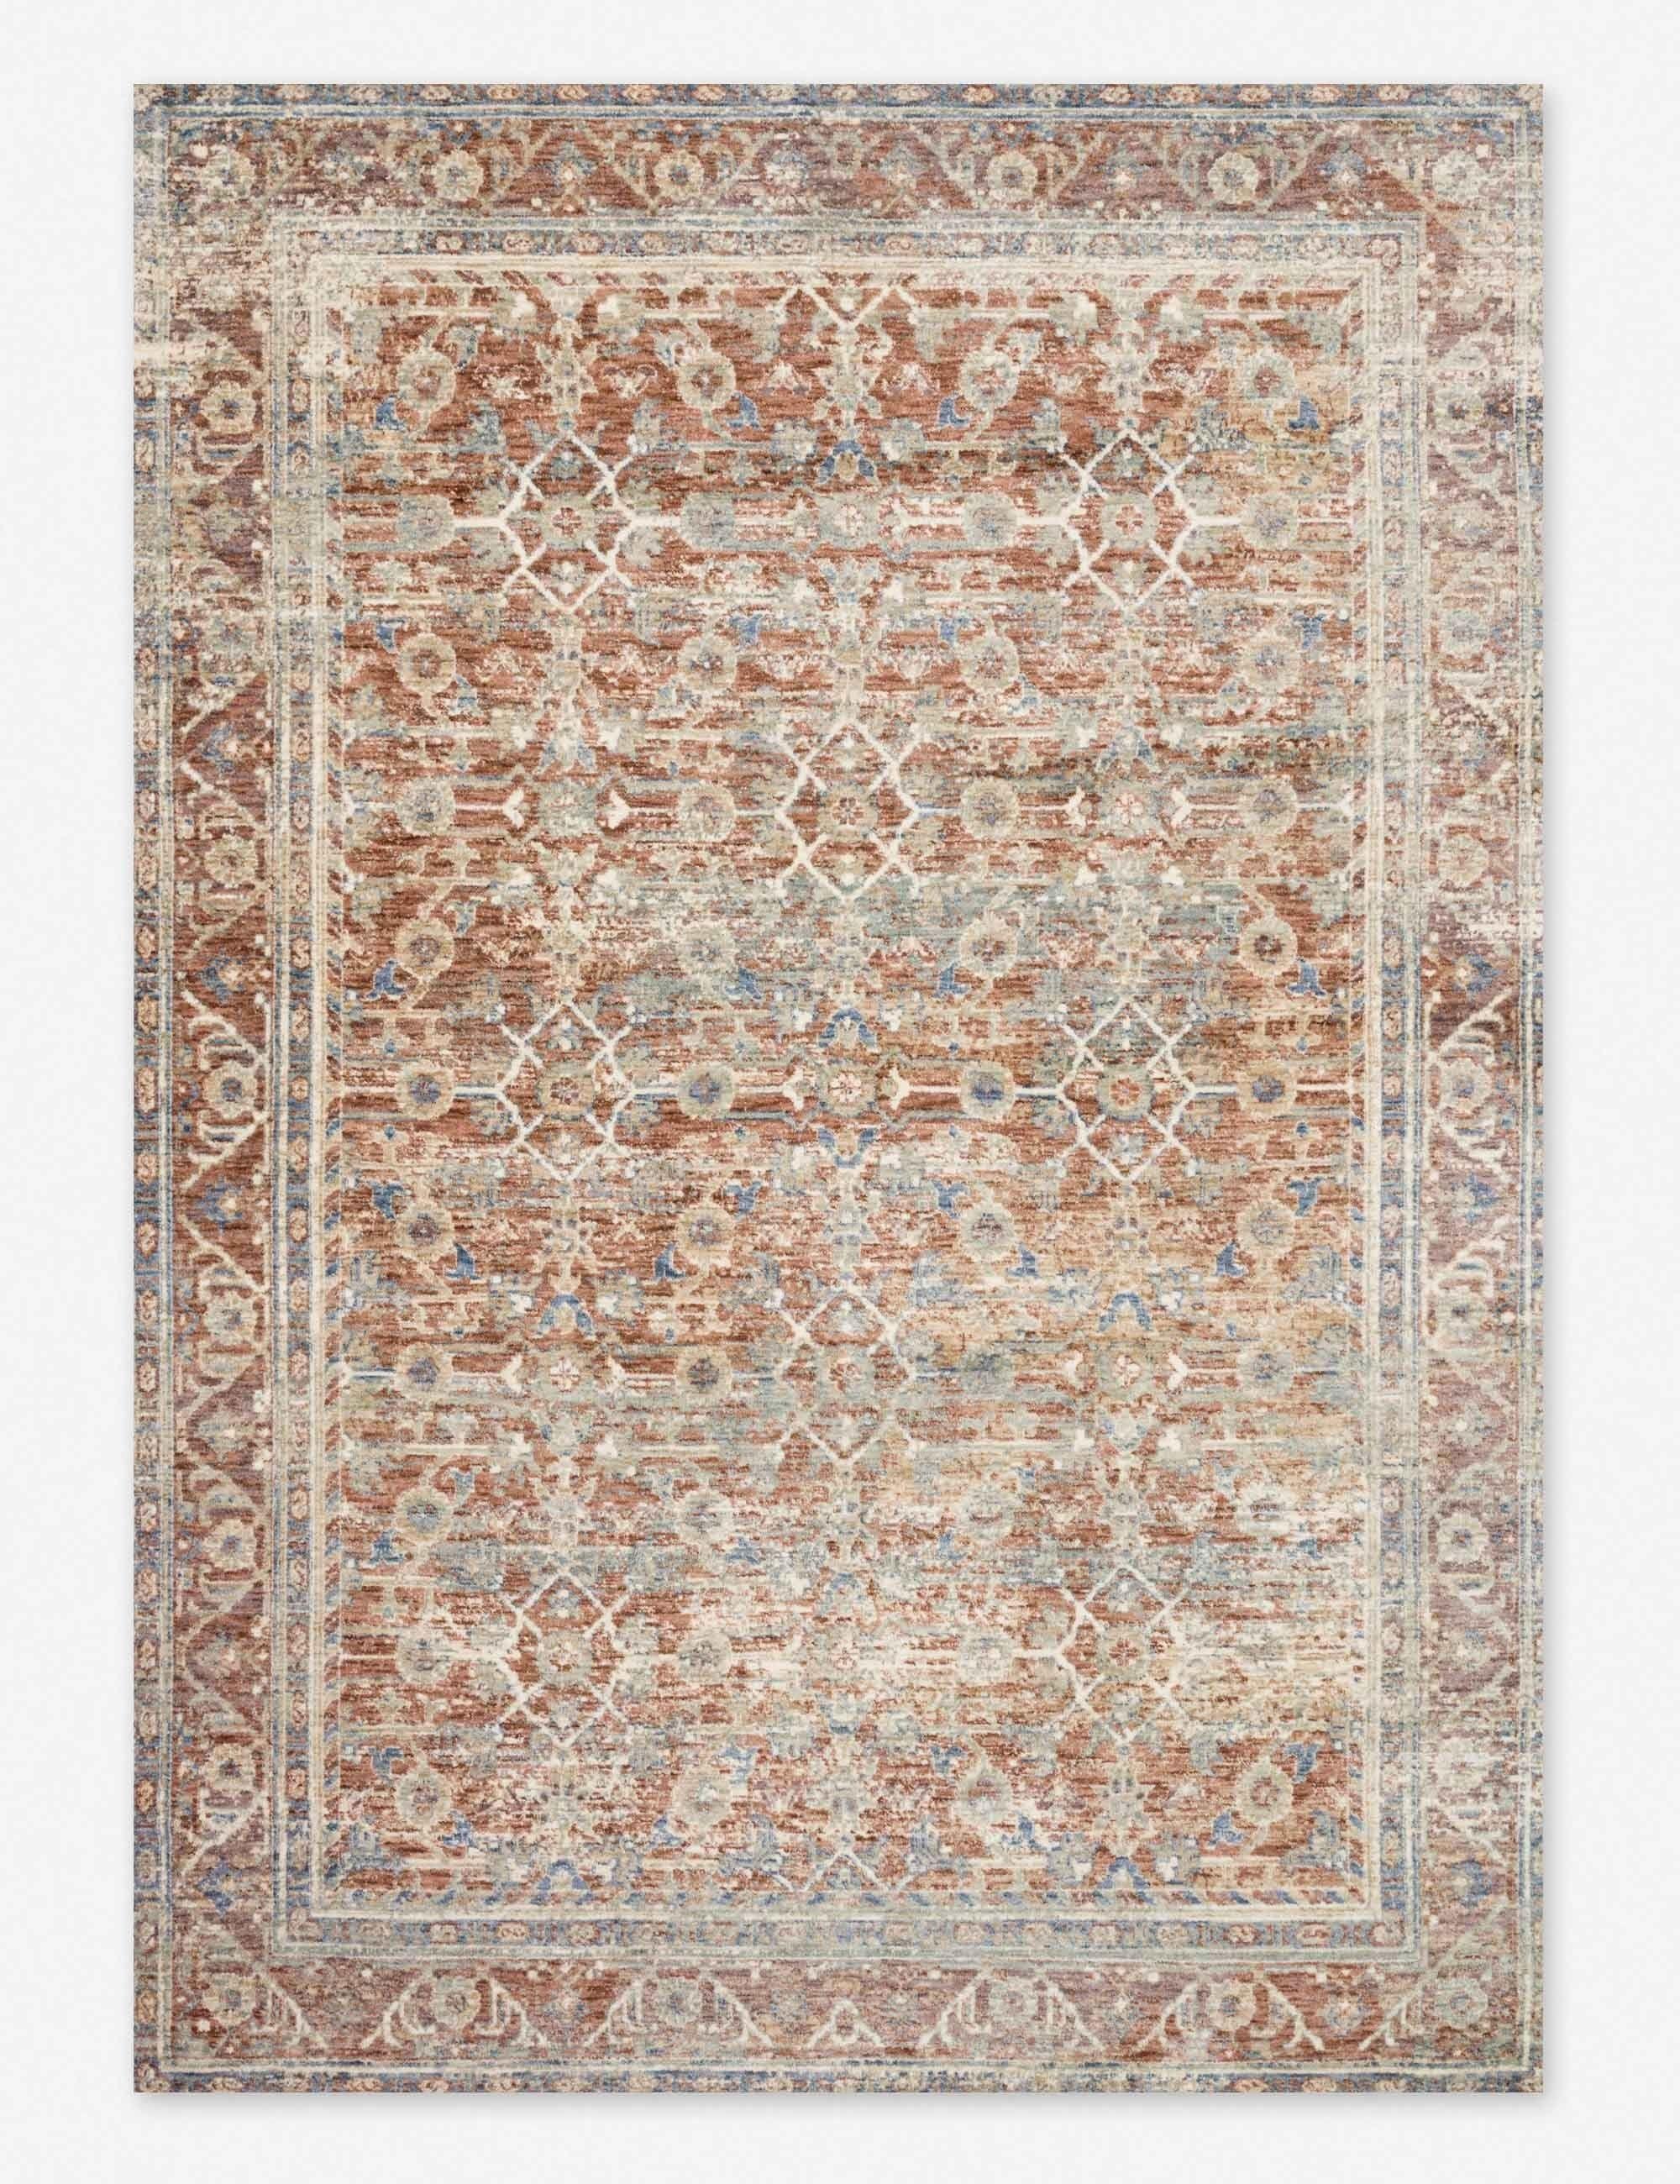 Grey Terracotta Rug Traditional Vintage Area Mat Living Room Dining Floor Carpet